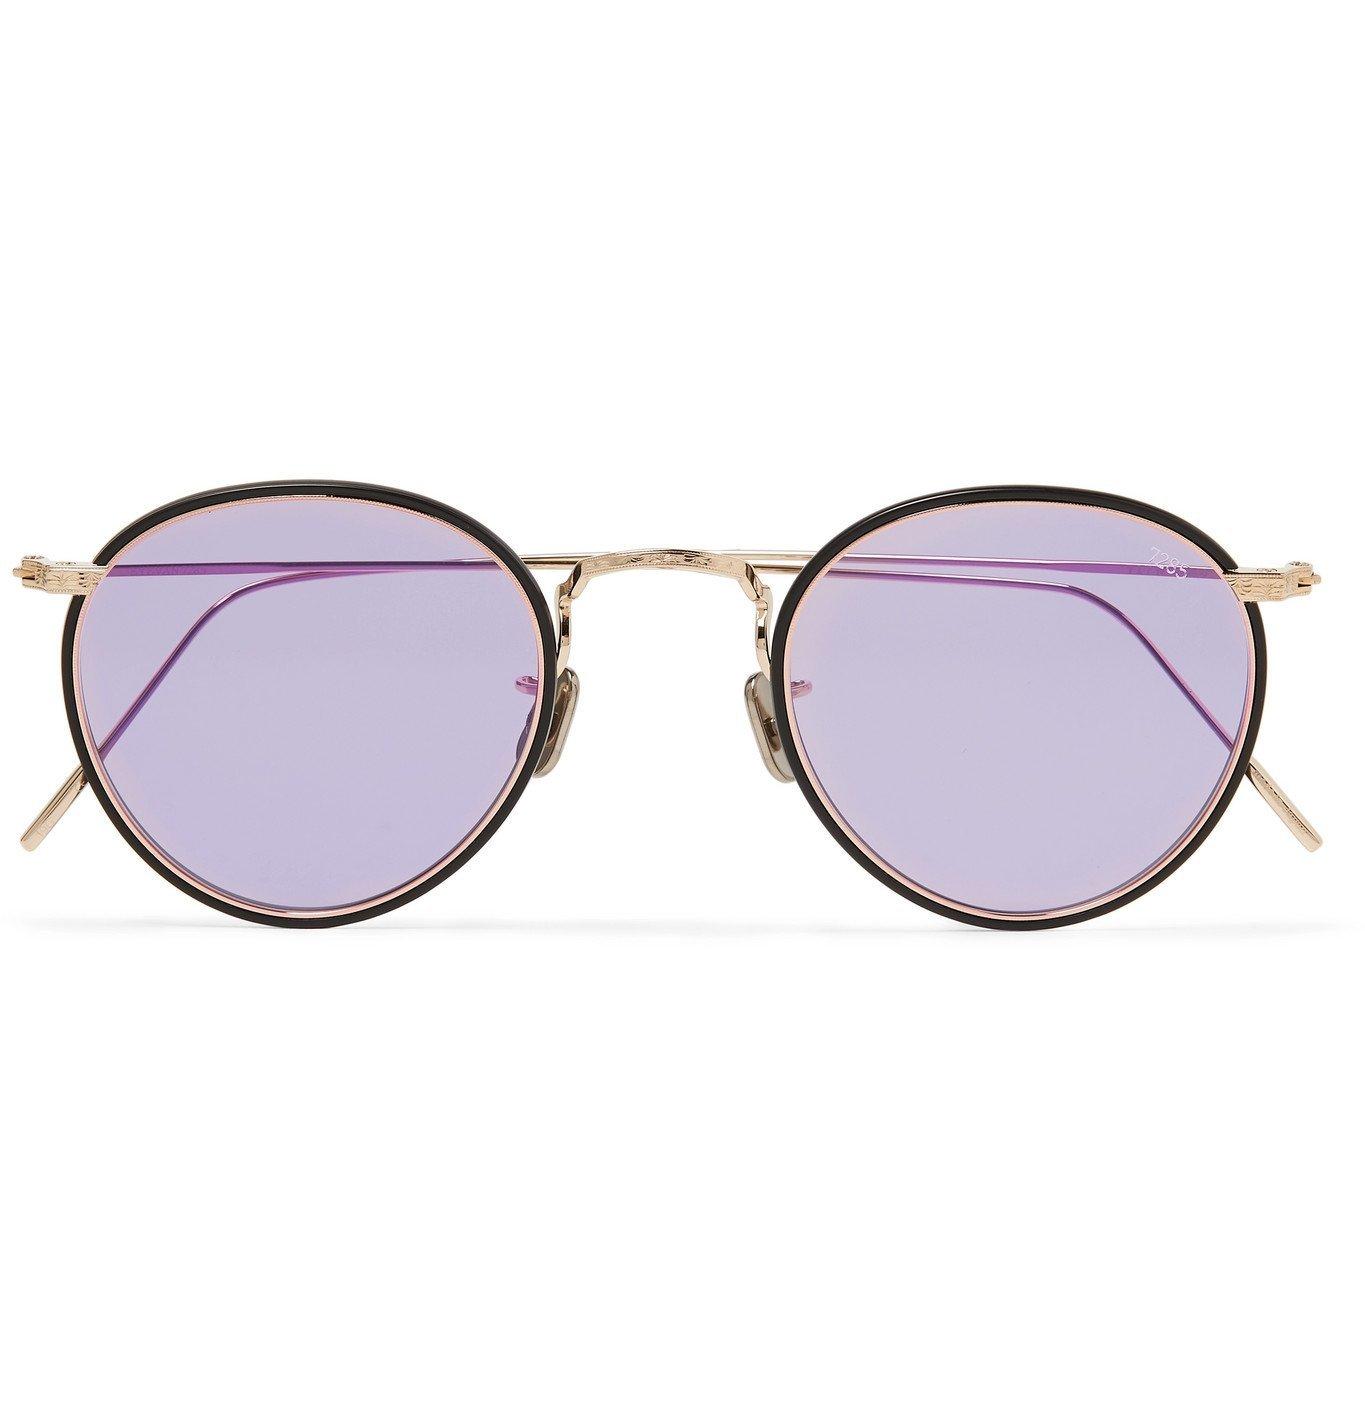 Photo: Eyevan 7285 - Round-Frame Acetate and Gold-Tone Sunglasses - Purple